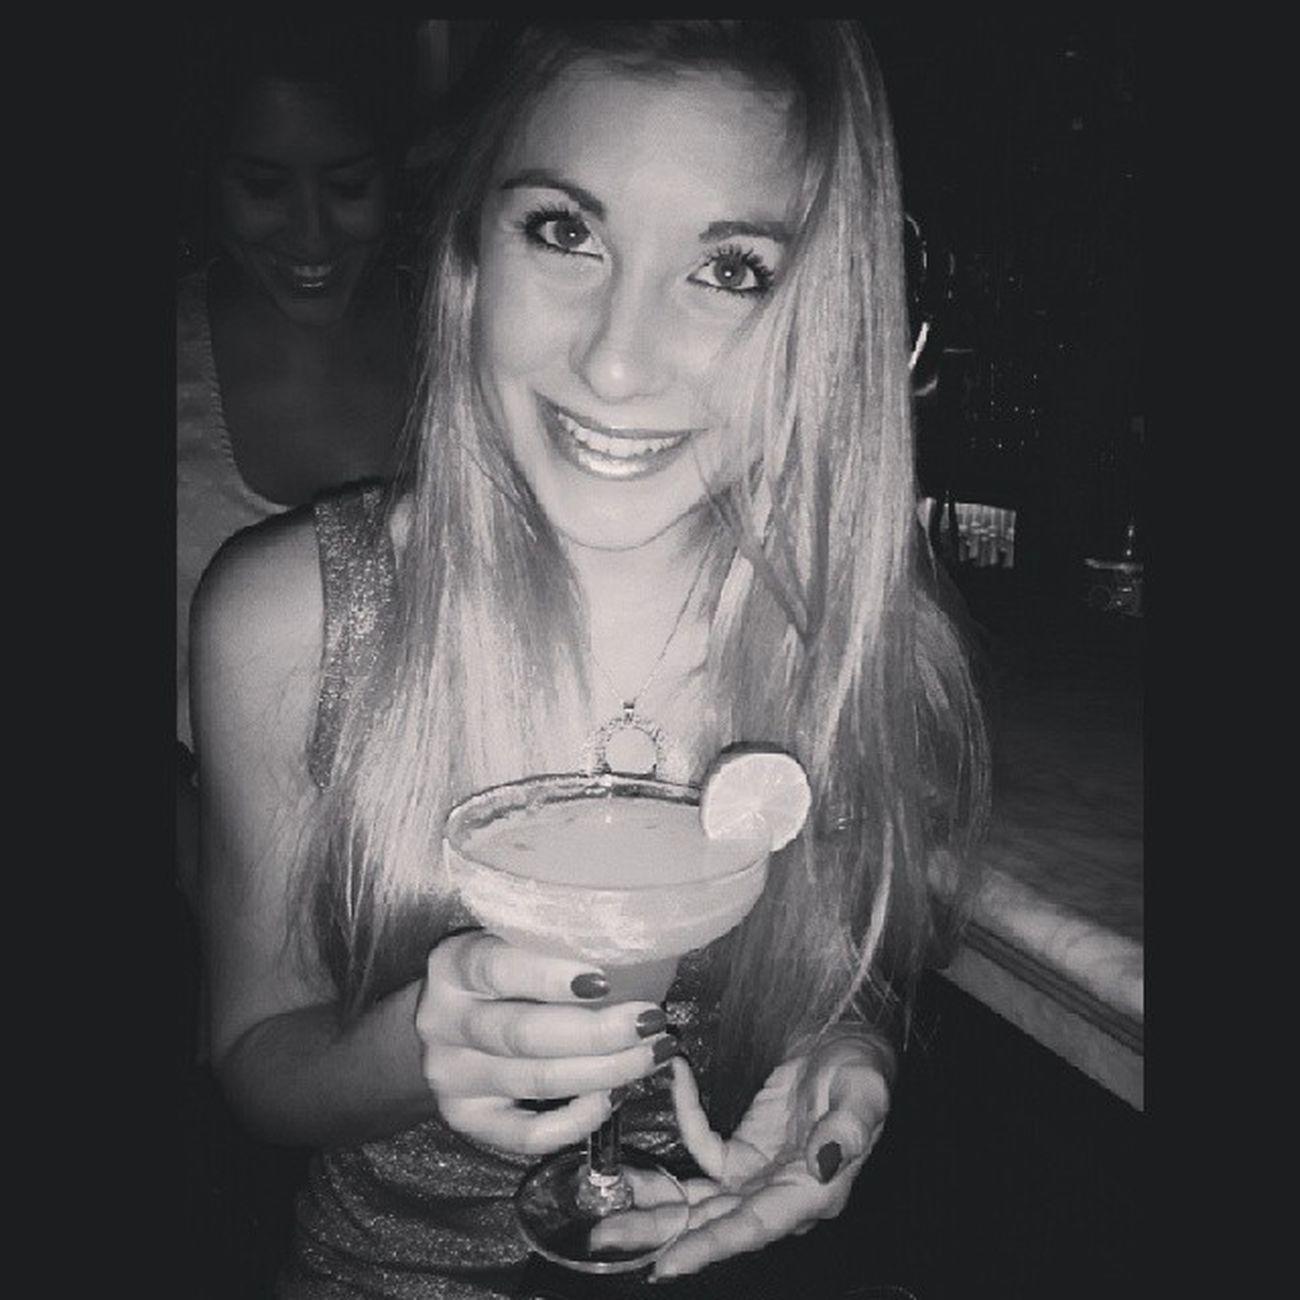 Saturday Quba Happydrink Margarita